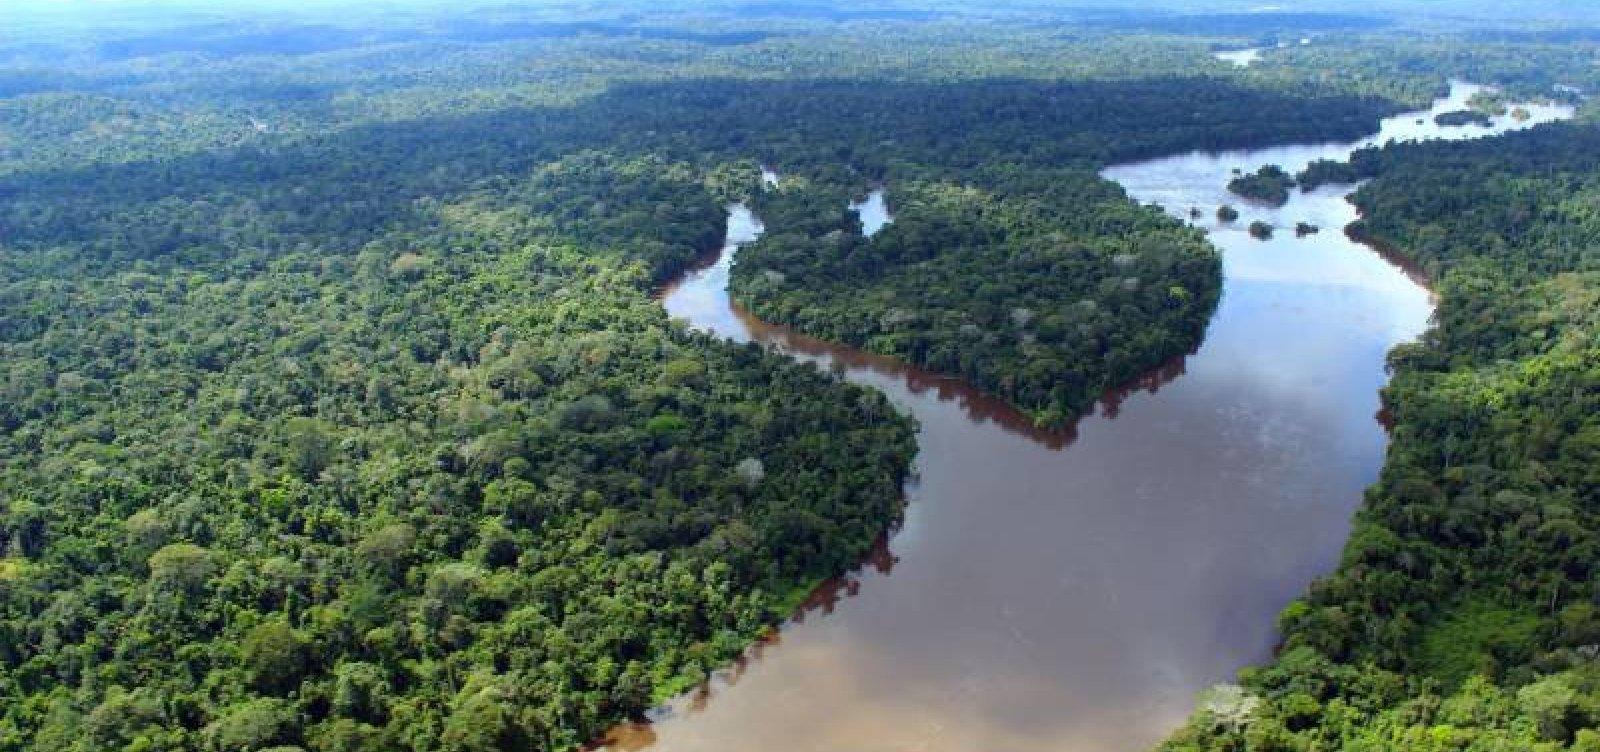 [Taxa de desmatamento pode ter aumento de 26% na Amazônia]